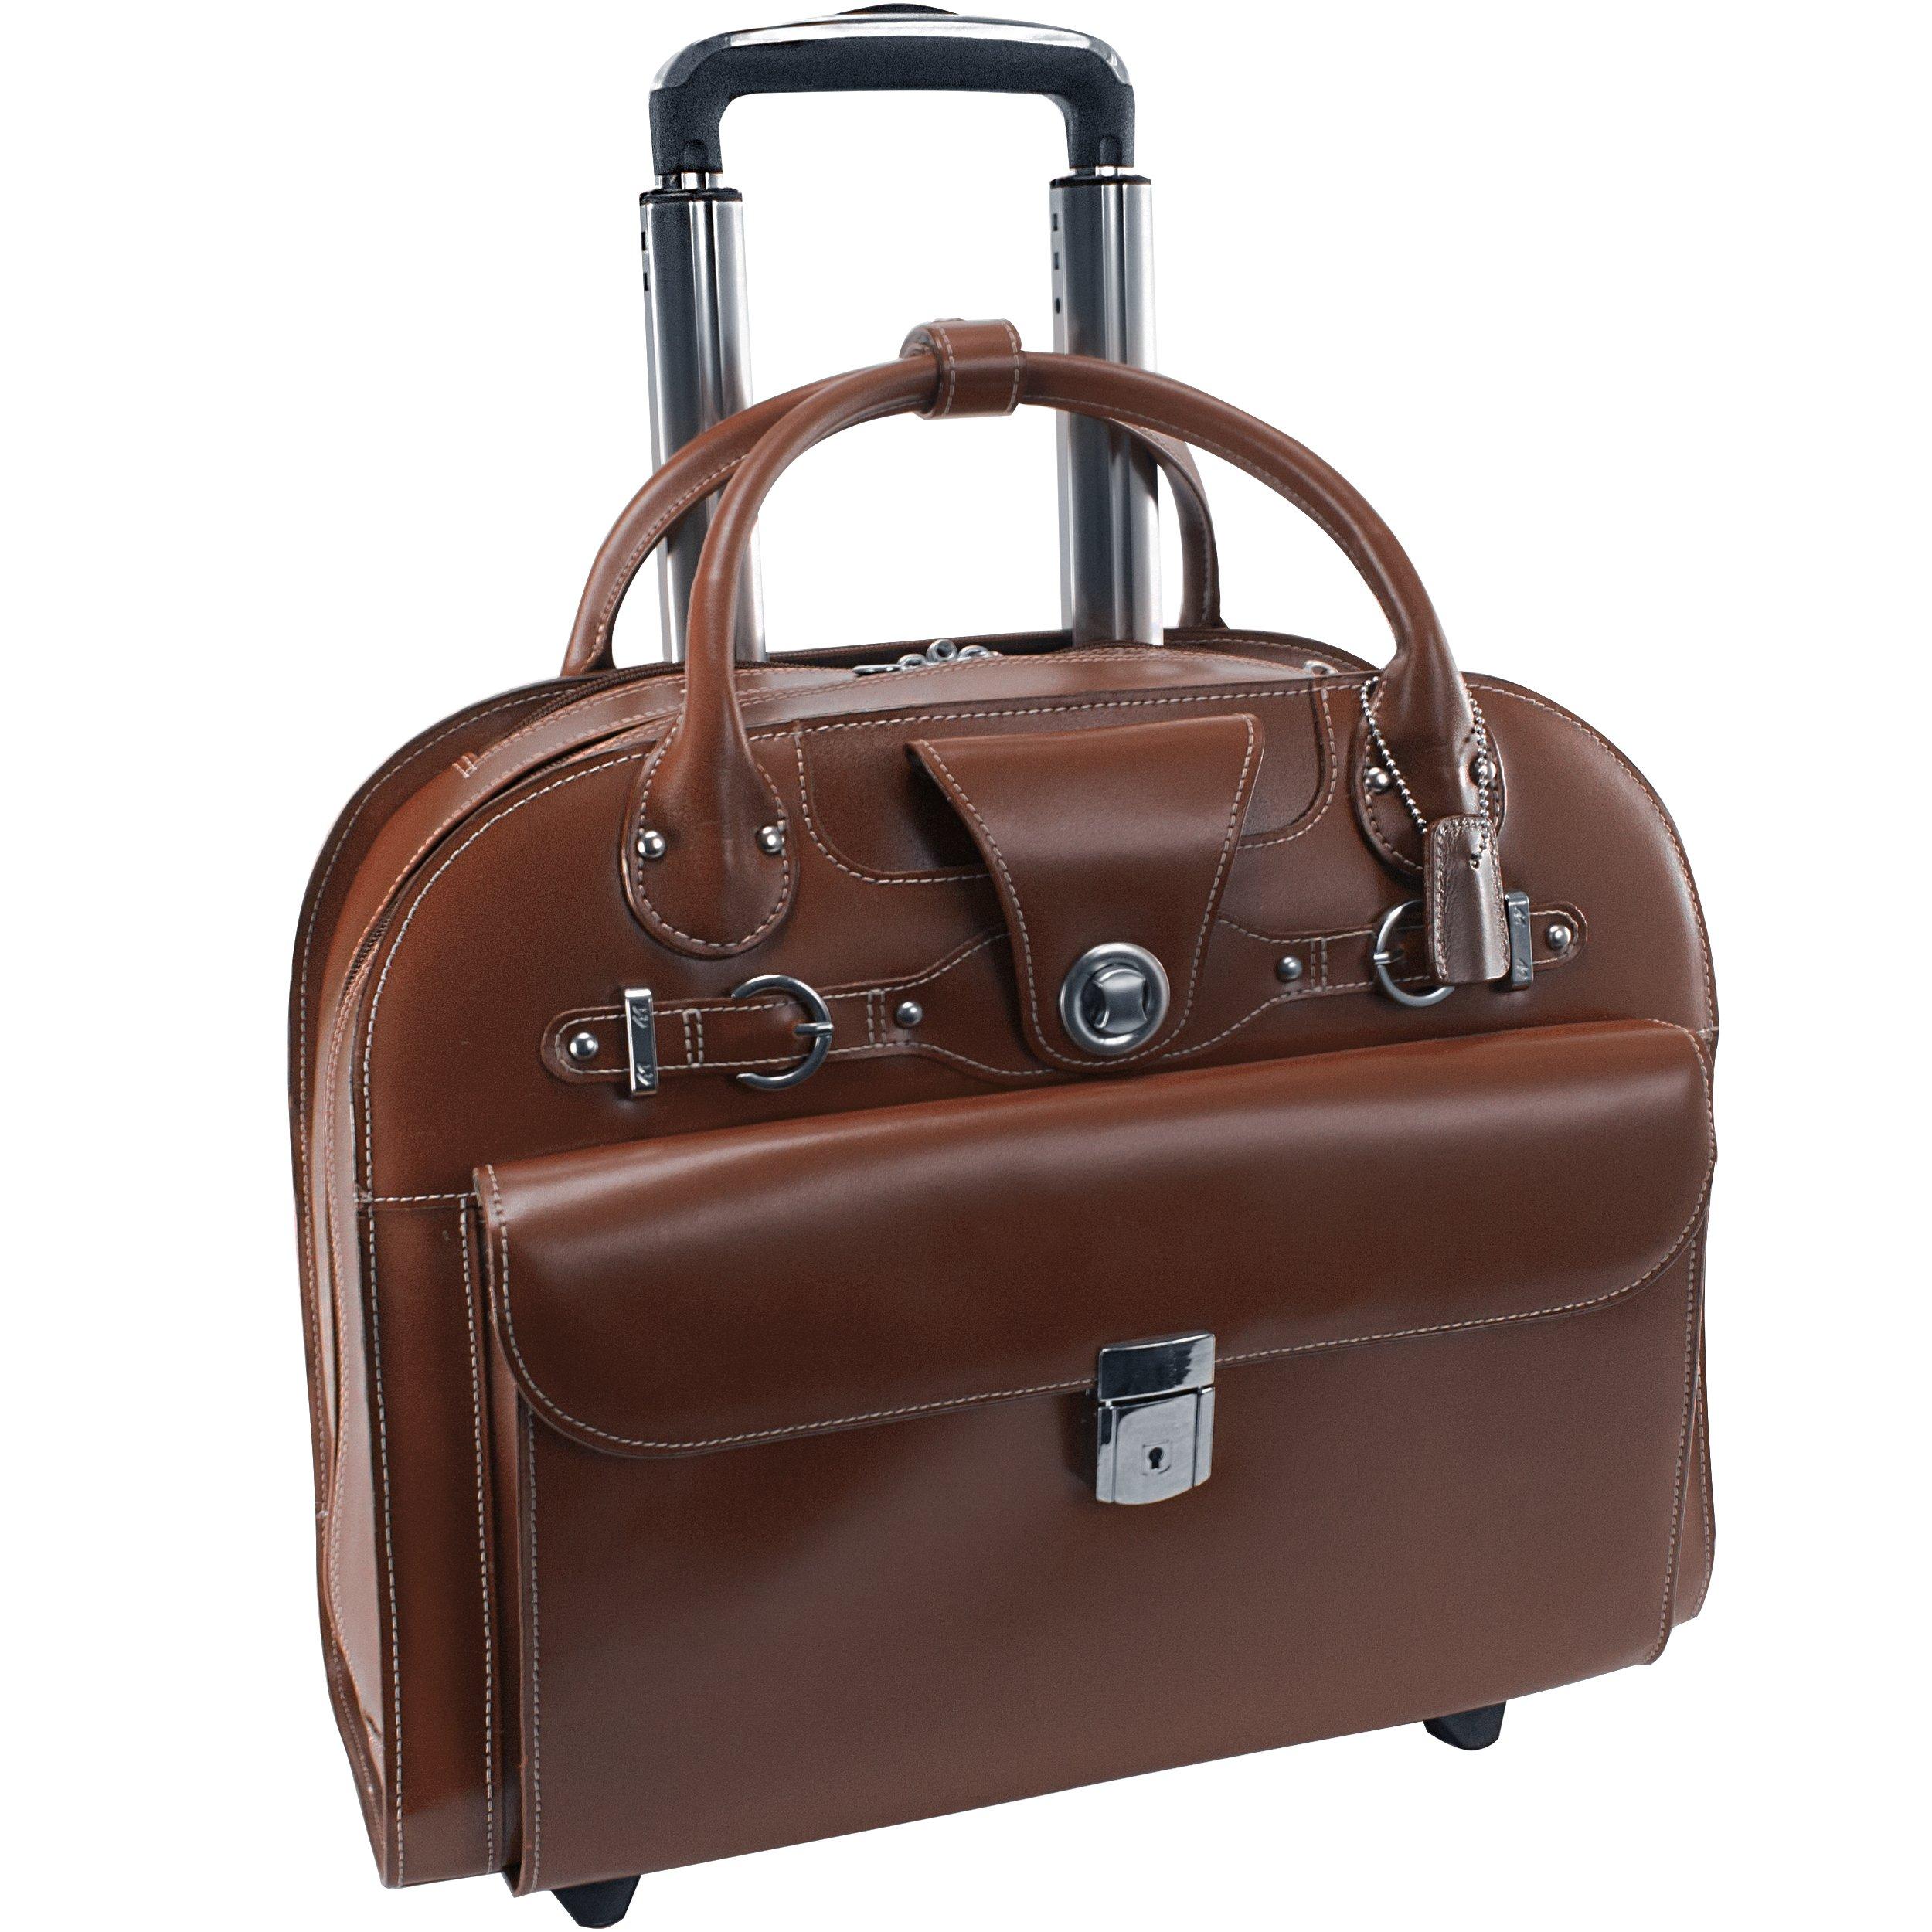 McKlein USA Edgebrook Brown 15.6'' Leather Wheeled Ladies' Laptop Case (96314)